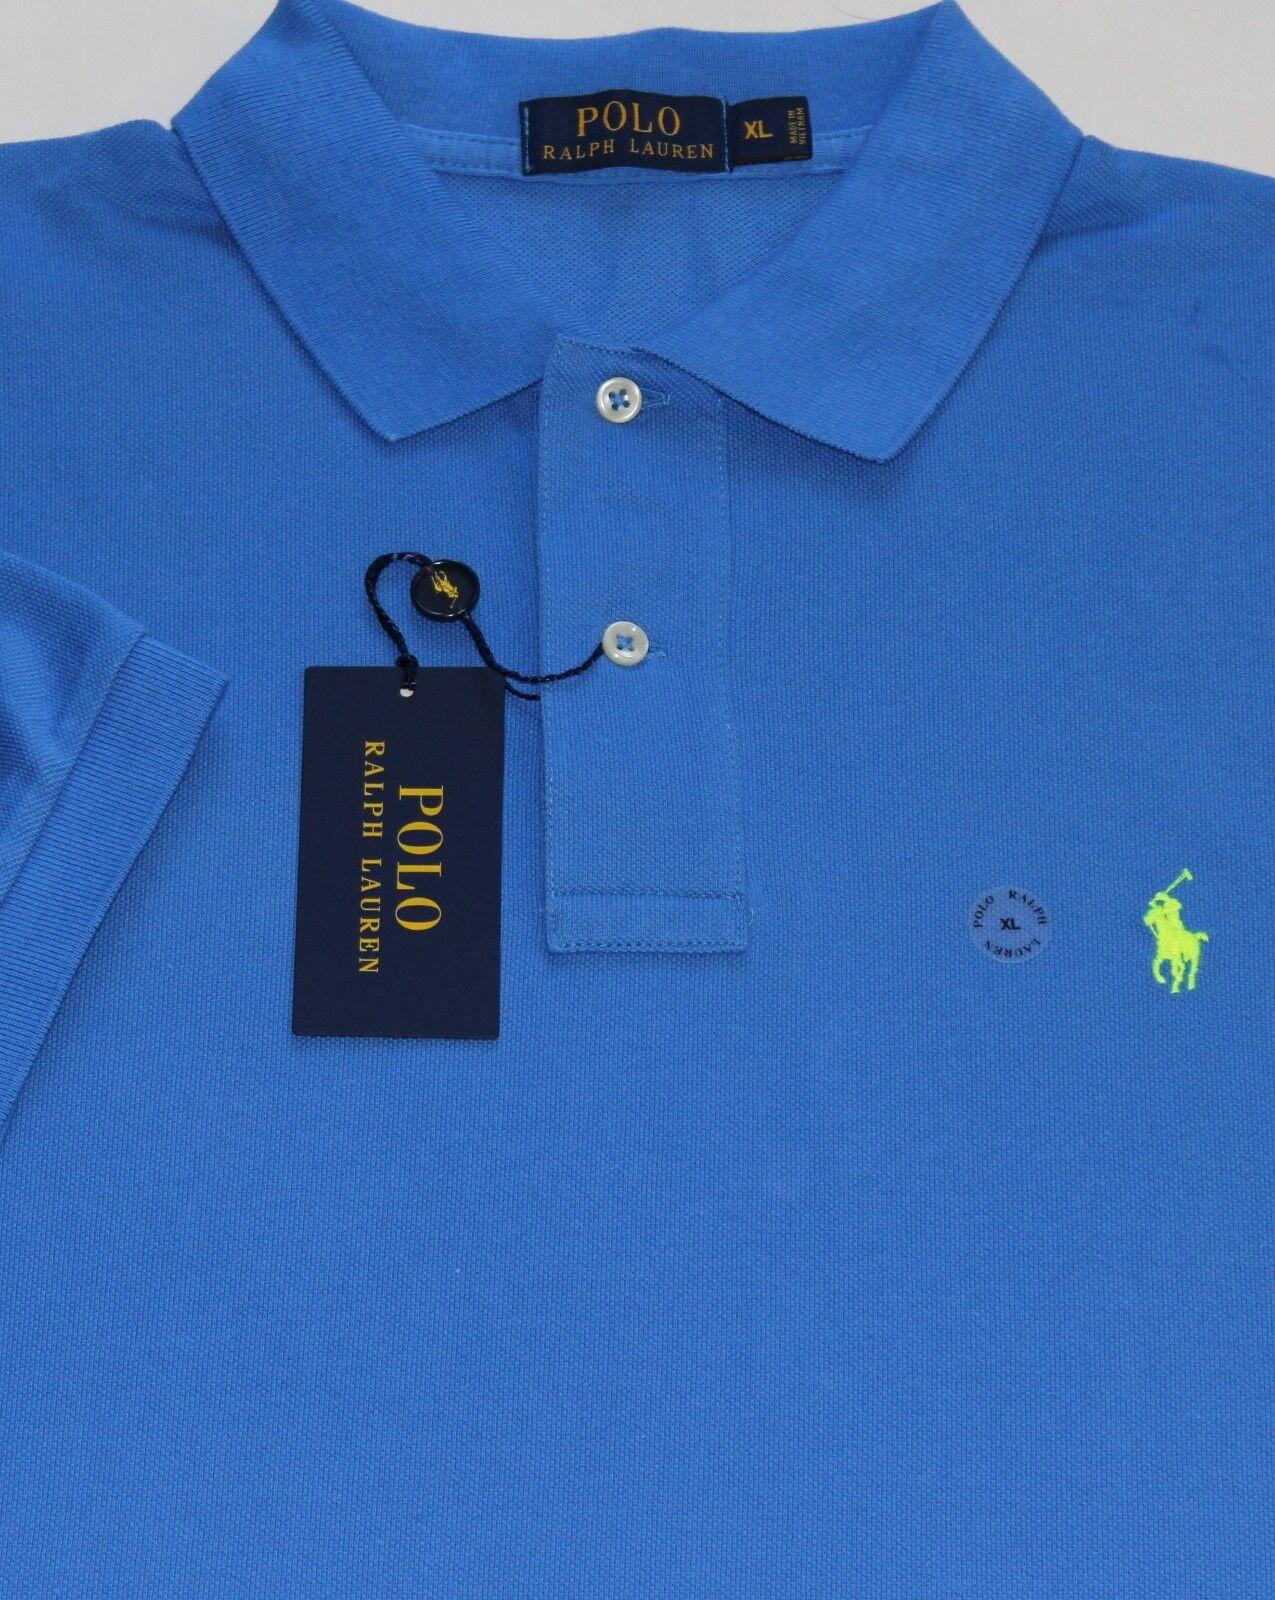 New  Polo Ralph Lauren Royal bluee Cotton Mesh Polo Shirt   BIG 3X